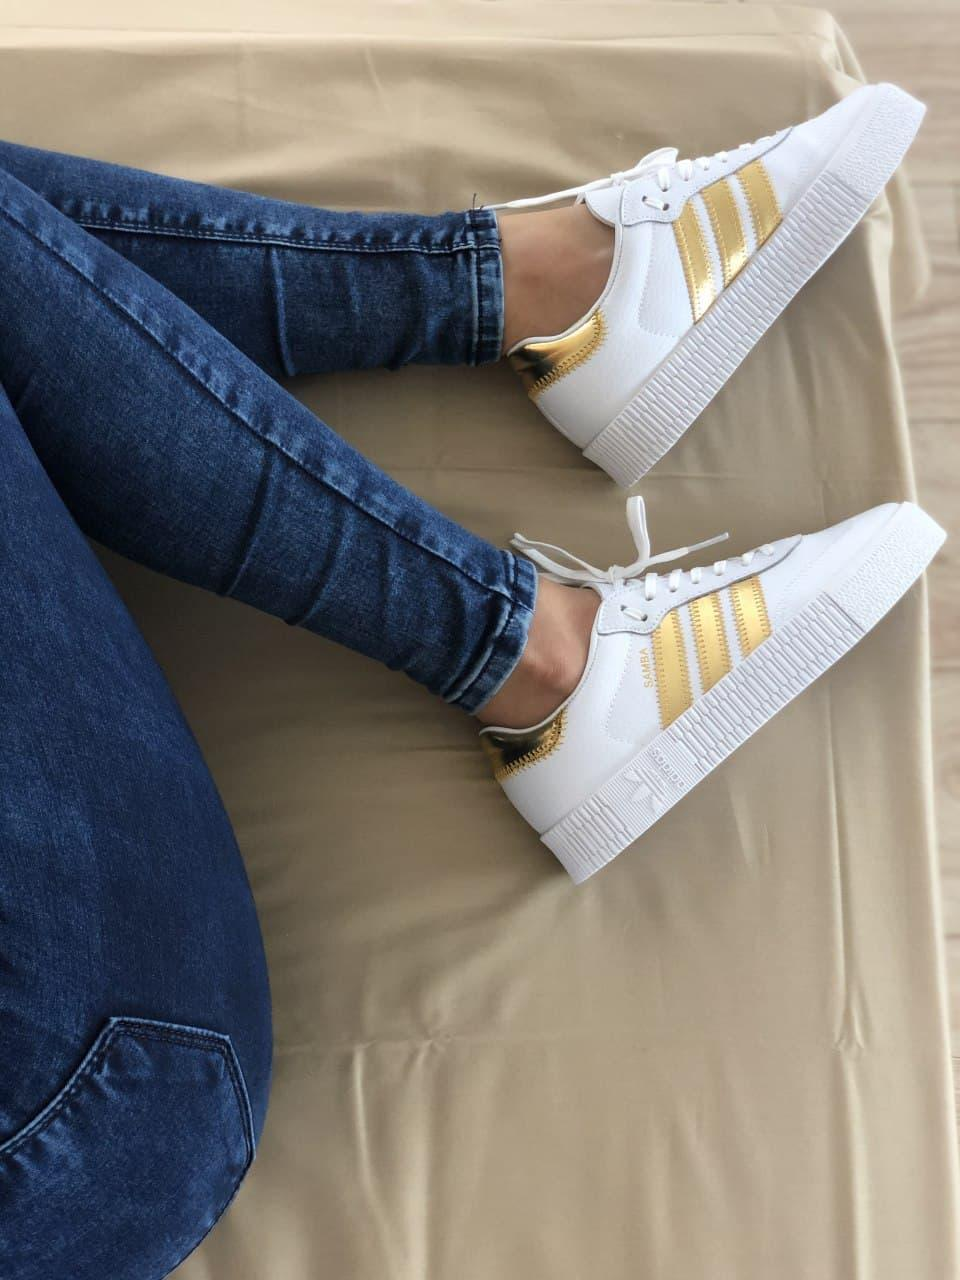 Женские кроссовки Adidas Samba White Gold